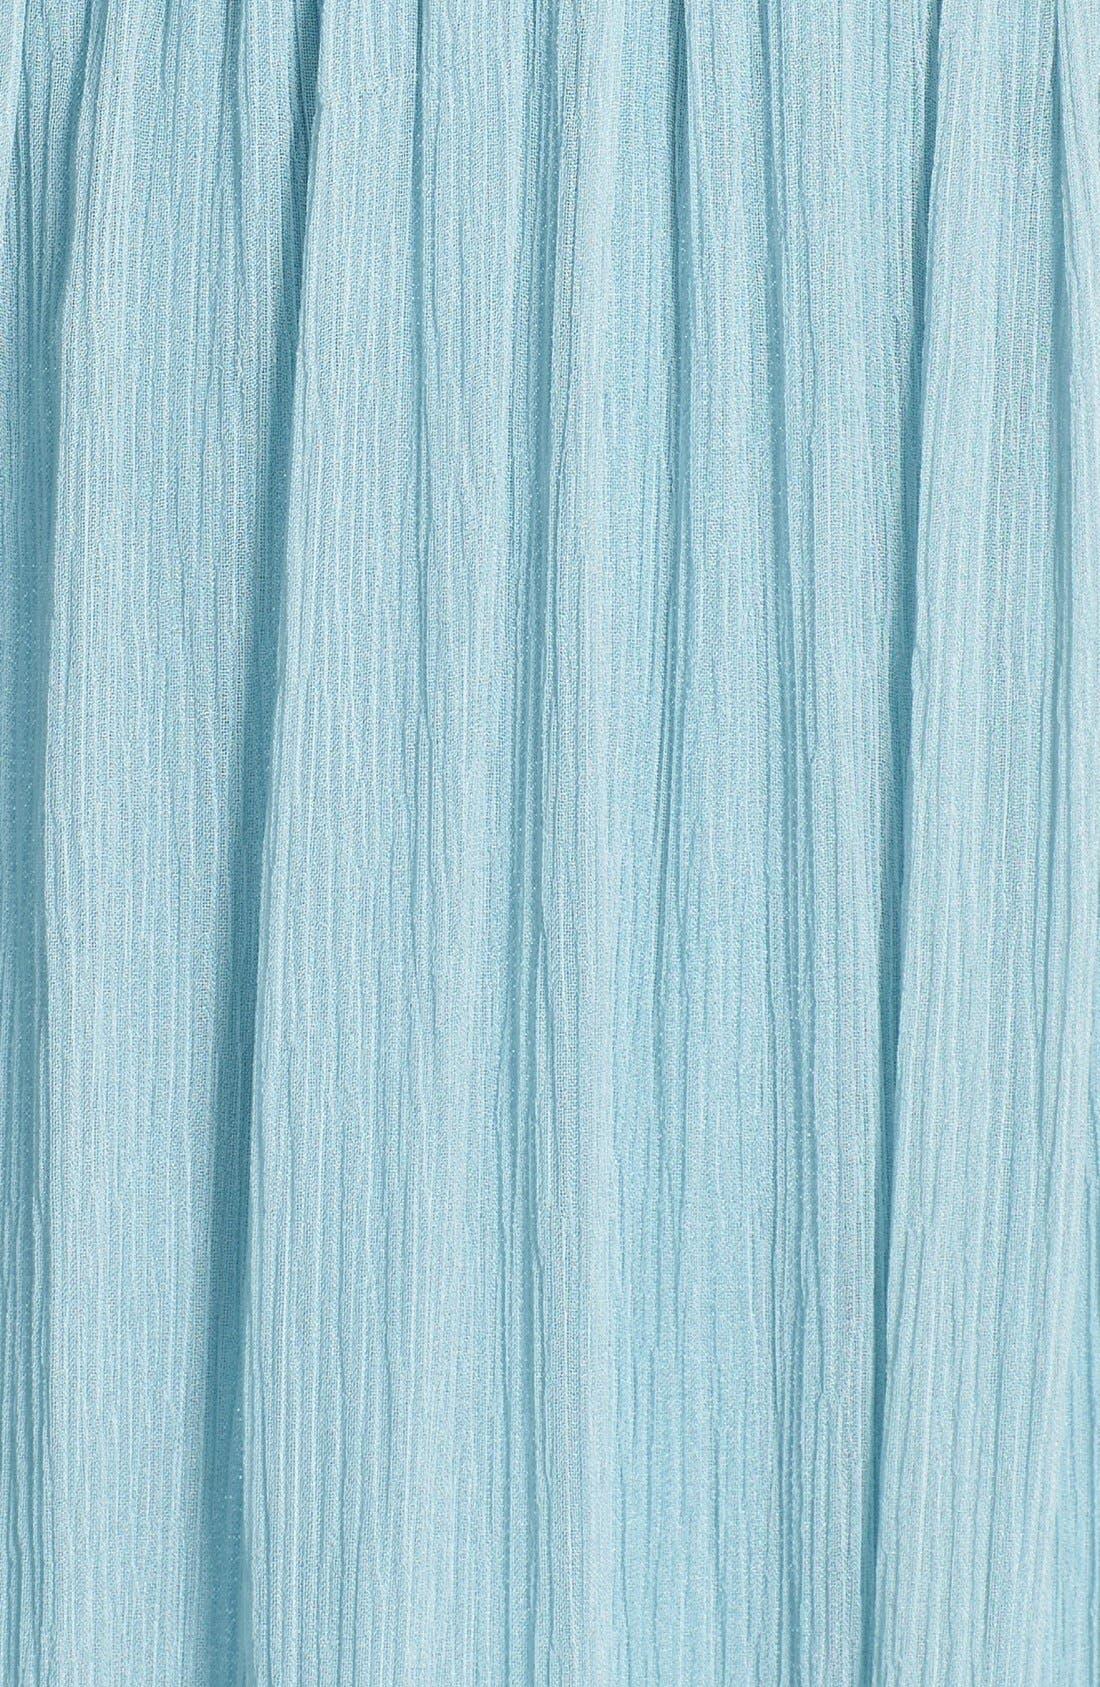 Alternate Image 3  - Jenny Yoo 'Sienna' Strapless Crinkle Silk Chiffon Dress